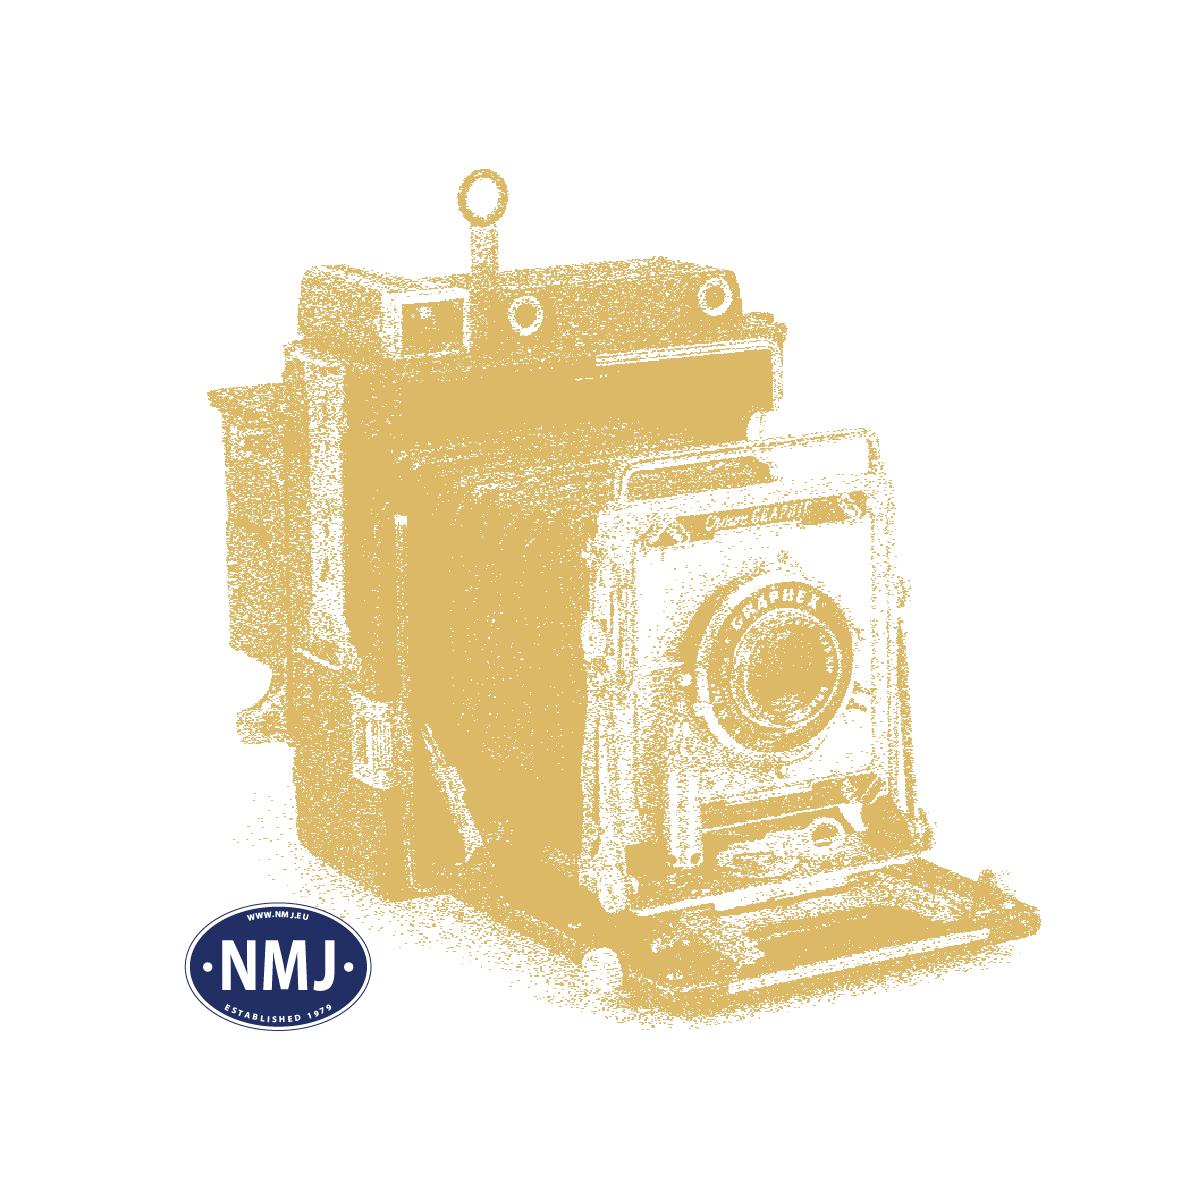 MBR55-1006 - Gressmatte #6, 30 x 40 Cm